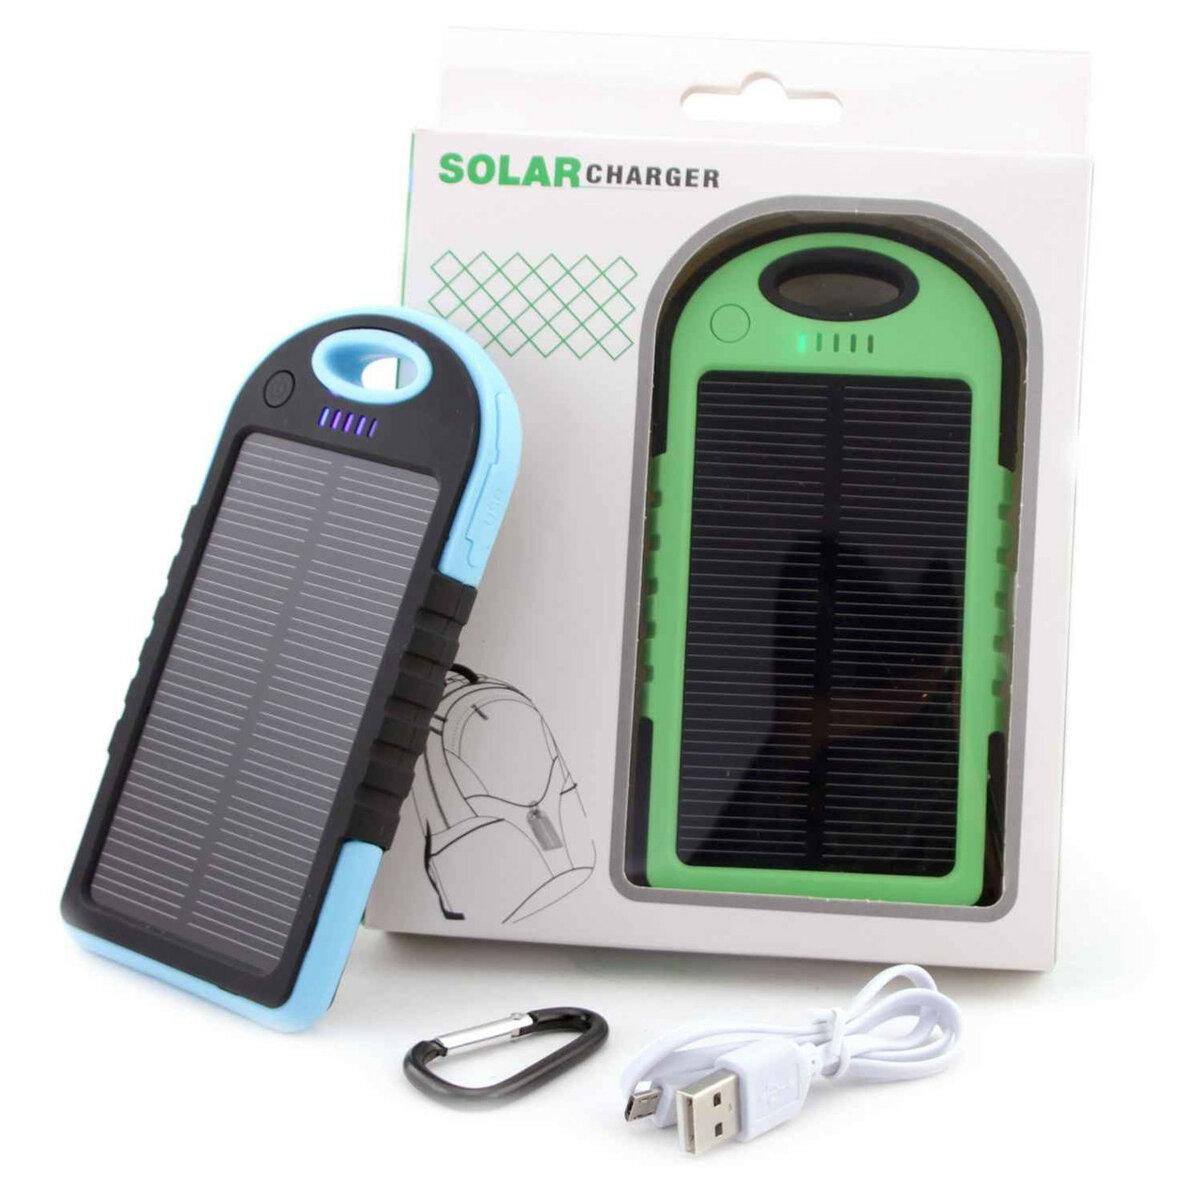 PowerBank Extreme на солнечных батареях в Запорожье